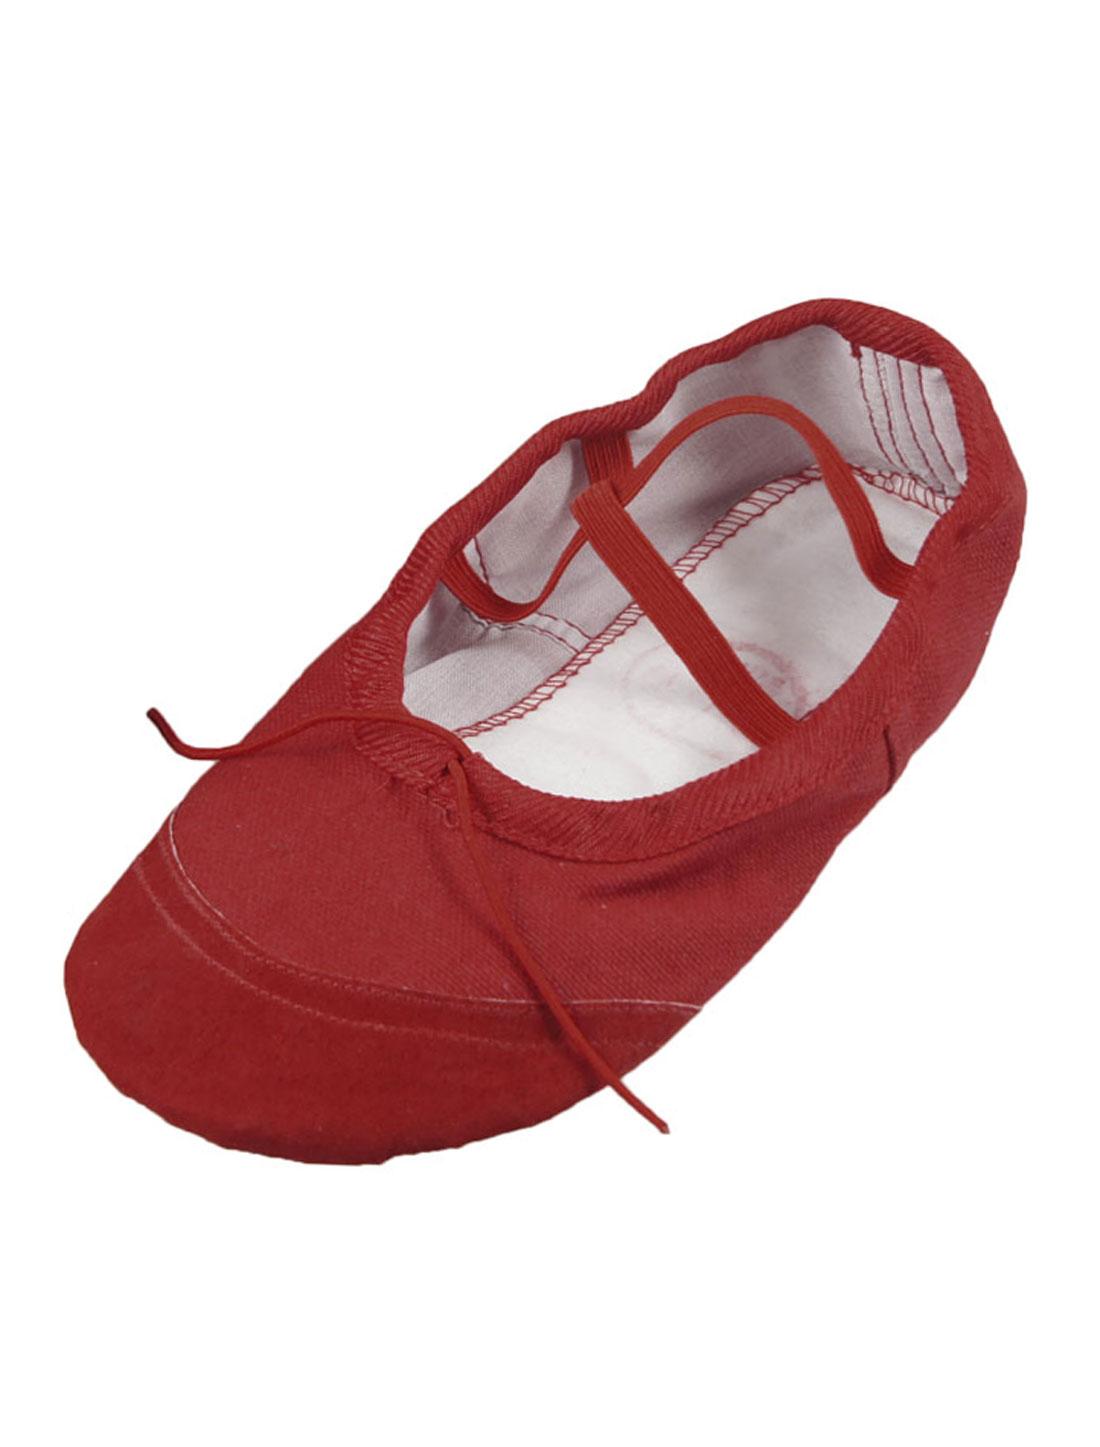 Women Red Split Sole Drawstring Top Ballet Dancing Flats Shoes EU 34